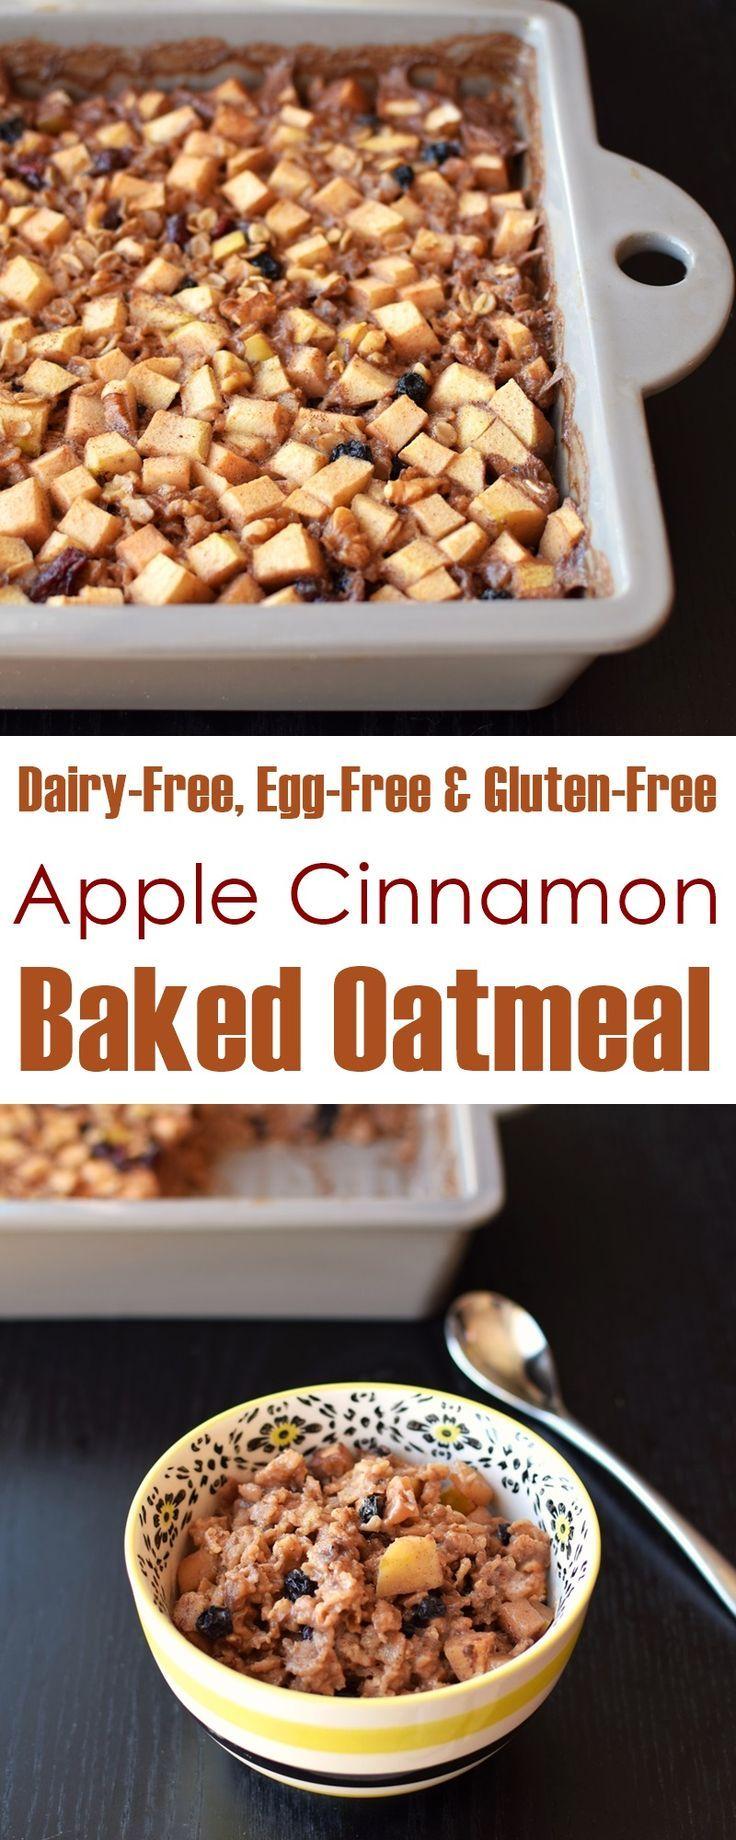 Vegan Apple Cinnamon Baked Oatmeal Recipe (dairy-free, egg-free, gluten-free and plant-based; optionally nut-free)